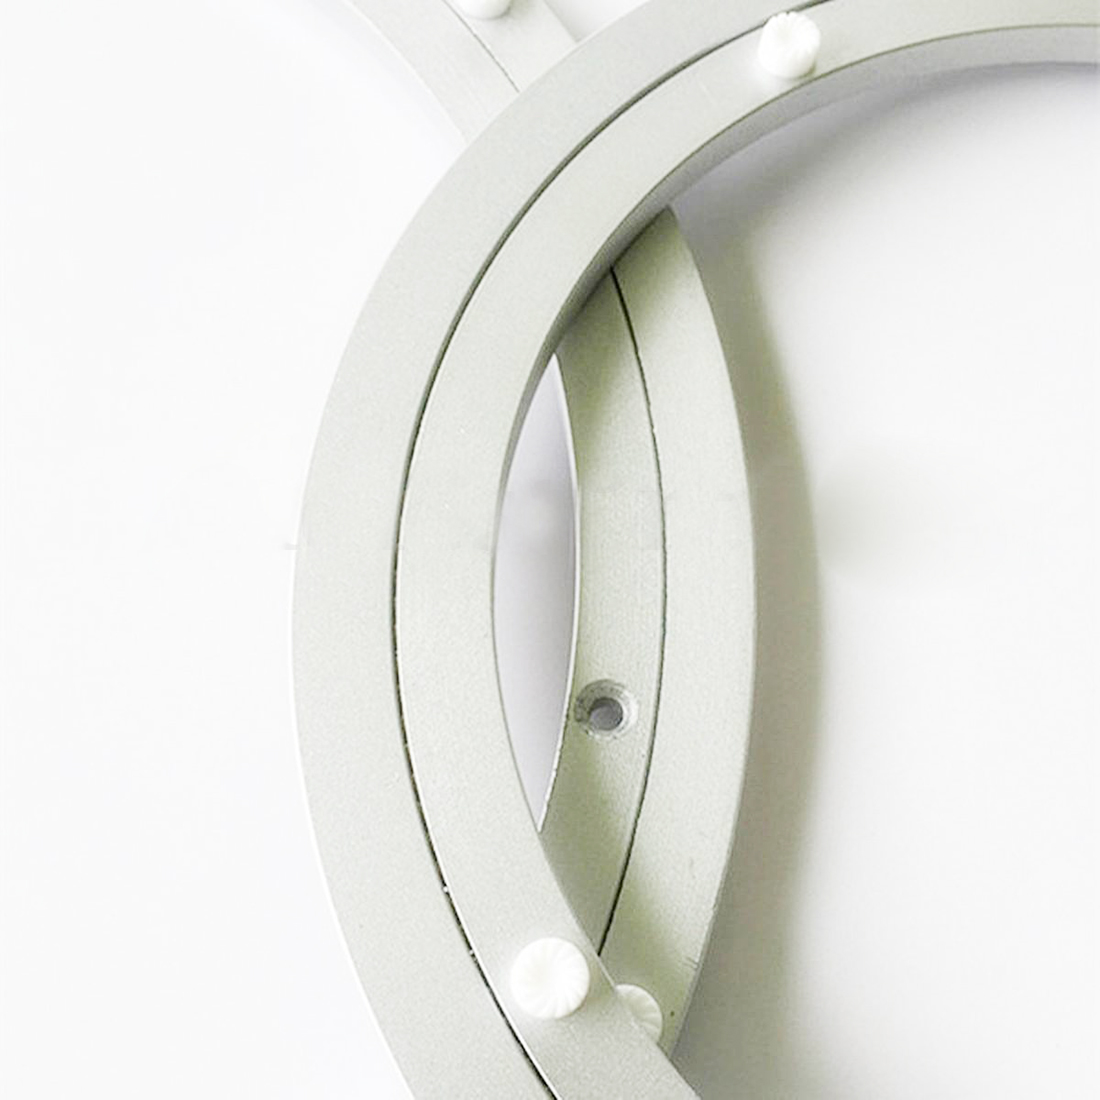 Intellektuell Neue Design Lazy Susan Aluminium Kugellager Plattenspieler Lager Schwenk Platte Swivel Platten Heimwerker